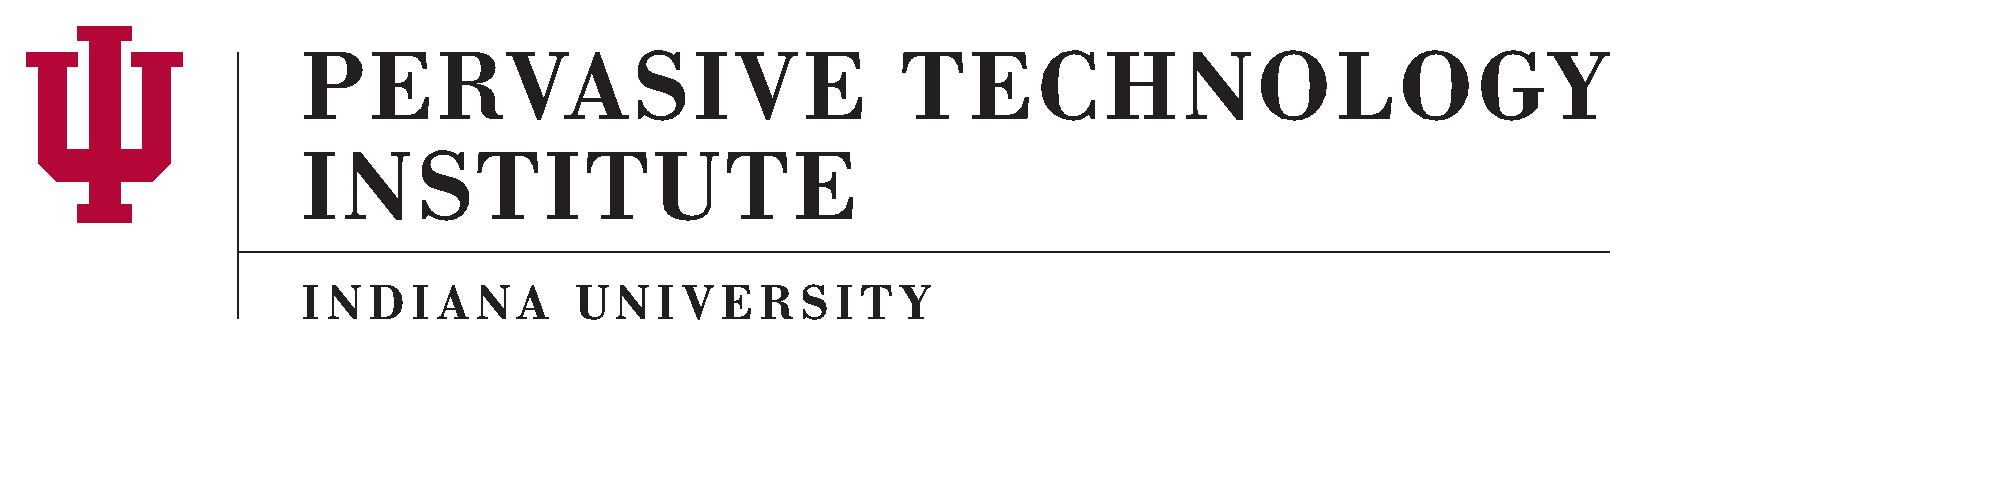 Pervasive Technology Institute